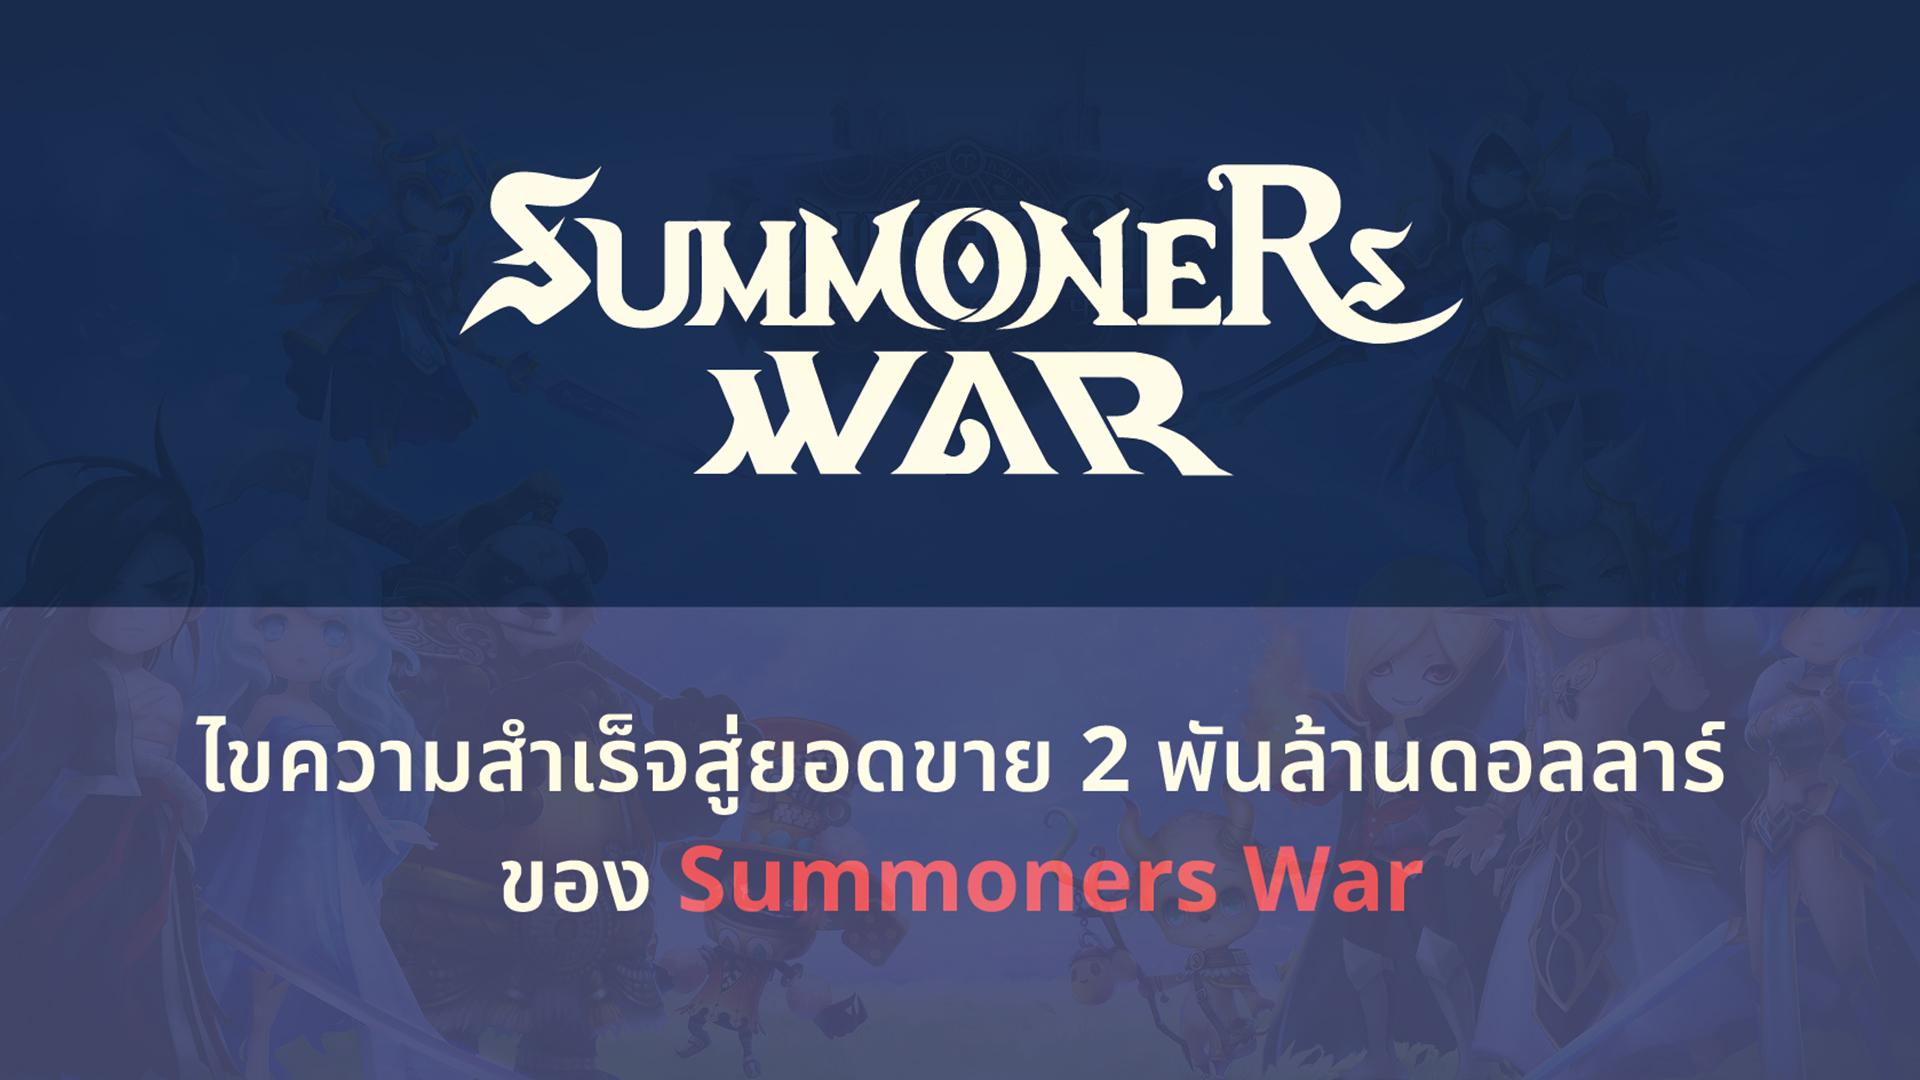 Summoners War 1182020 3